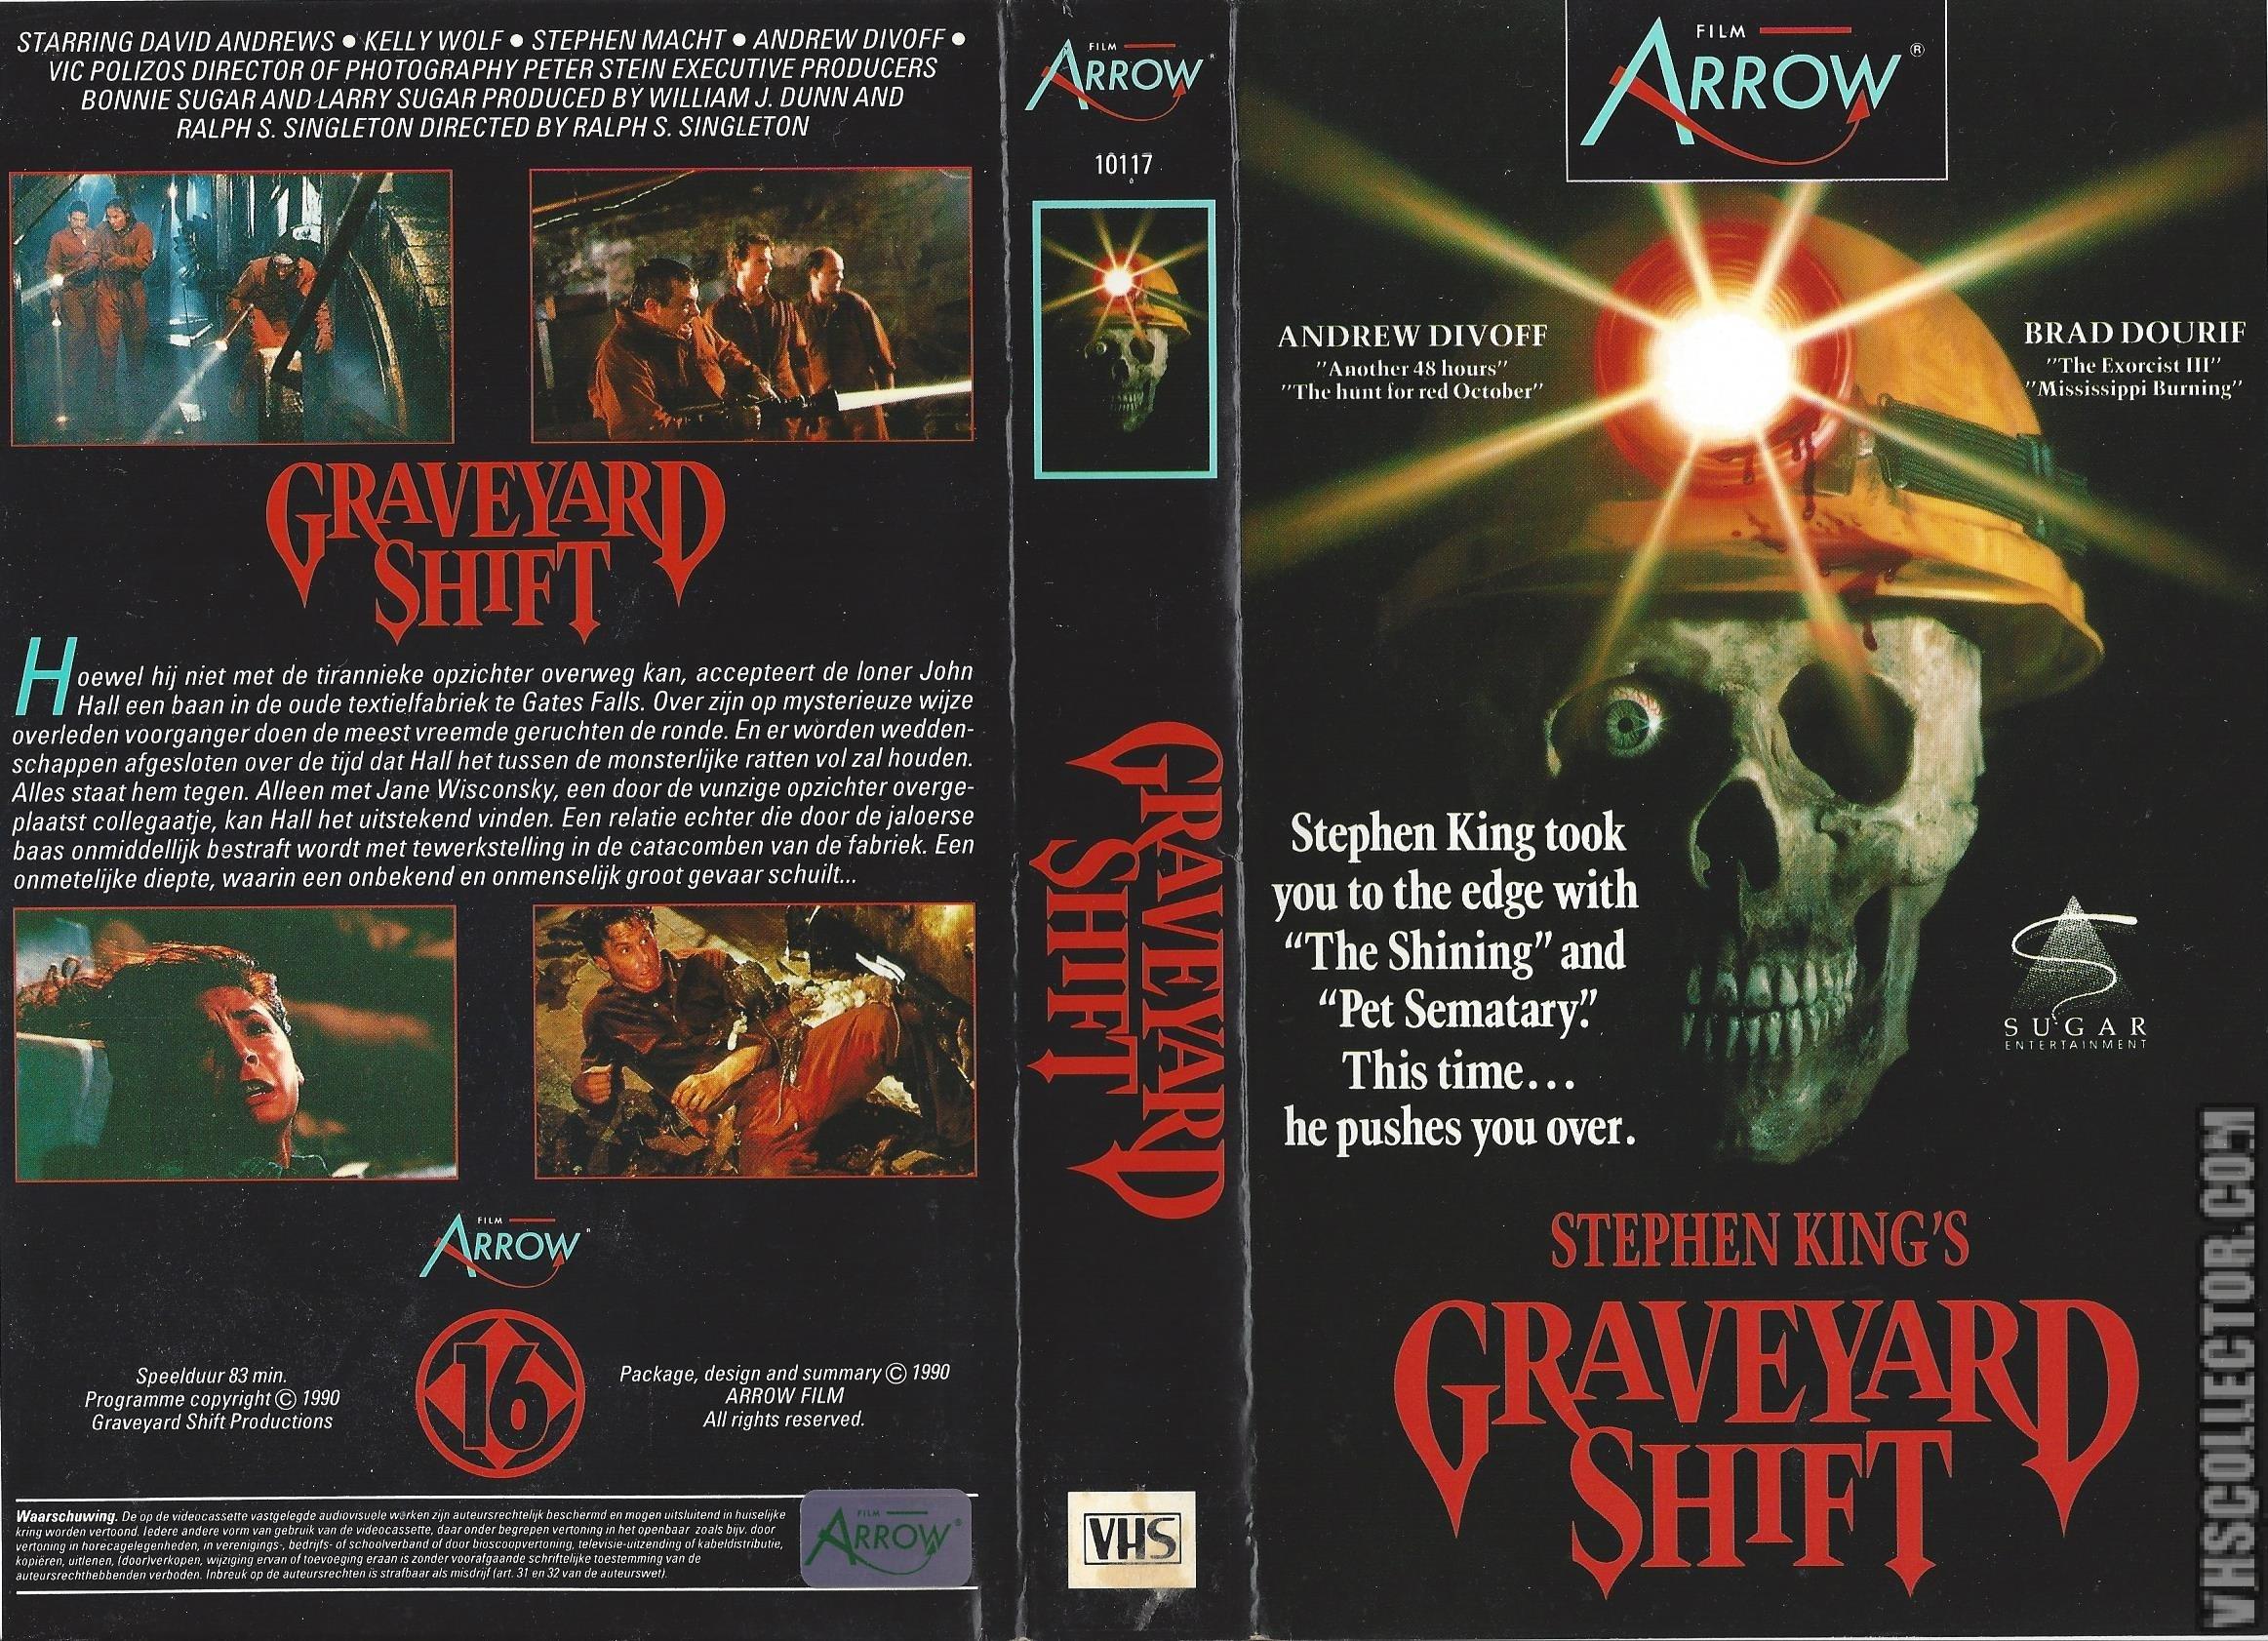 Stephen King's Graveyard Shift   VHSCollector.com - Your Analog ...